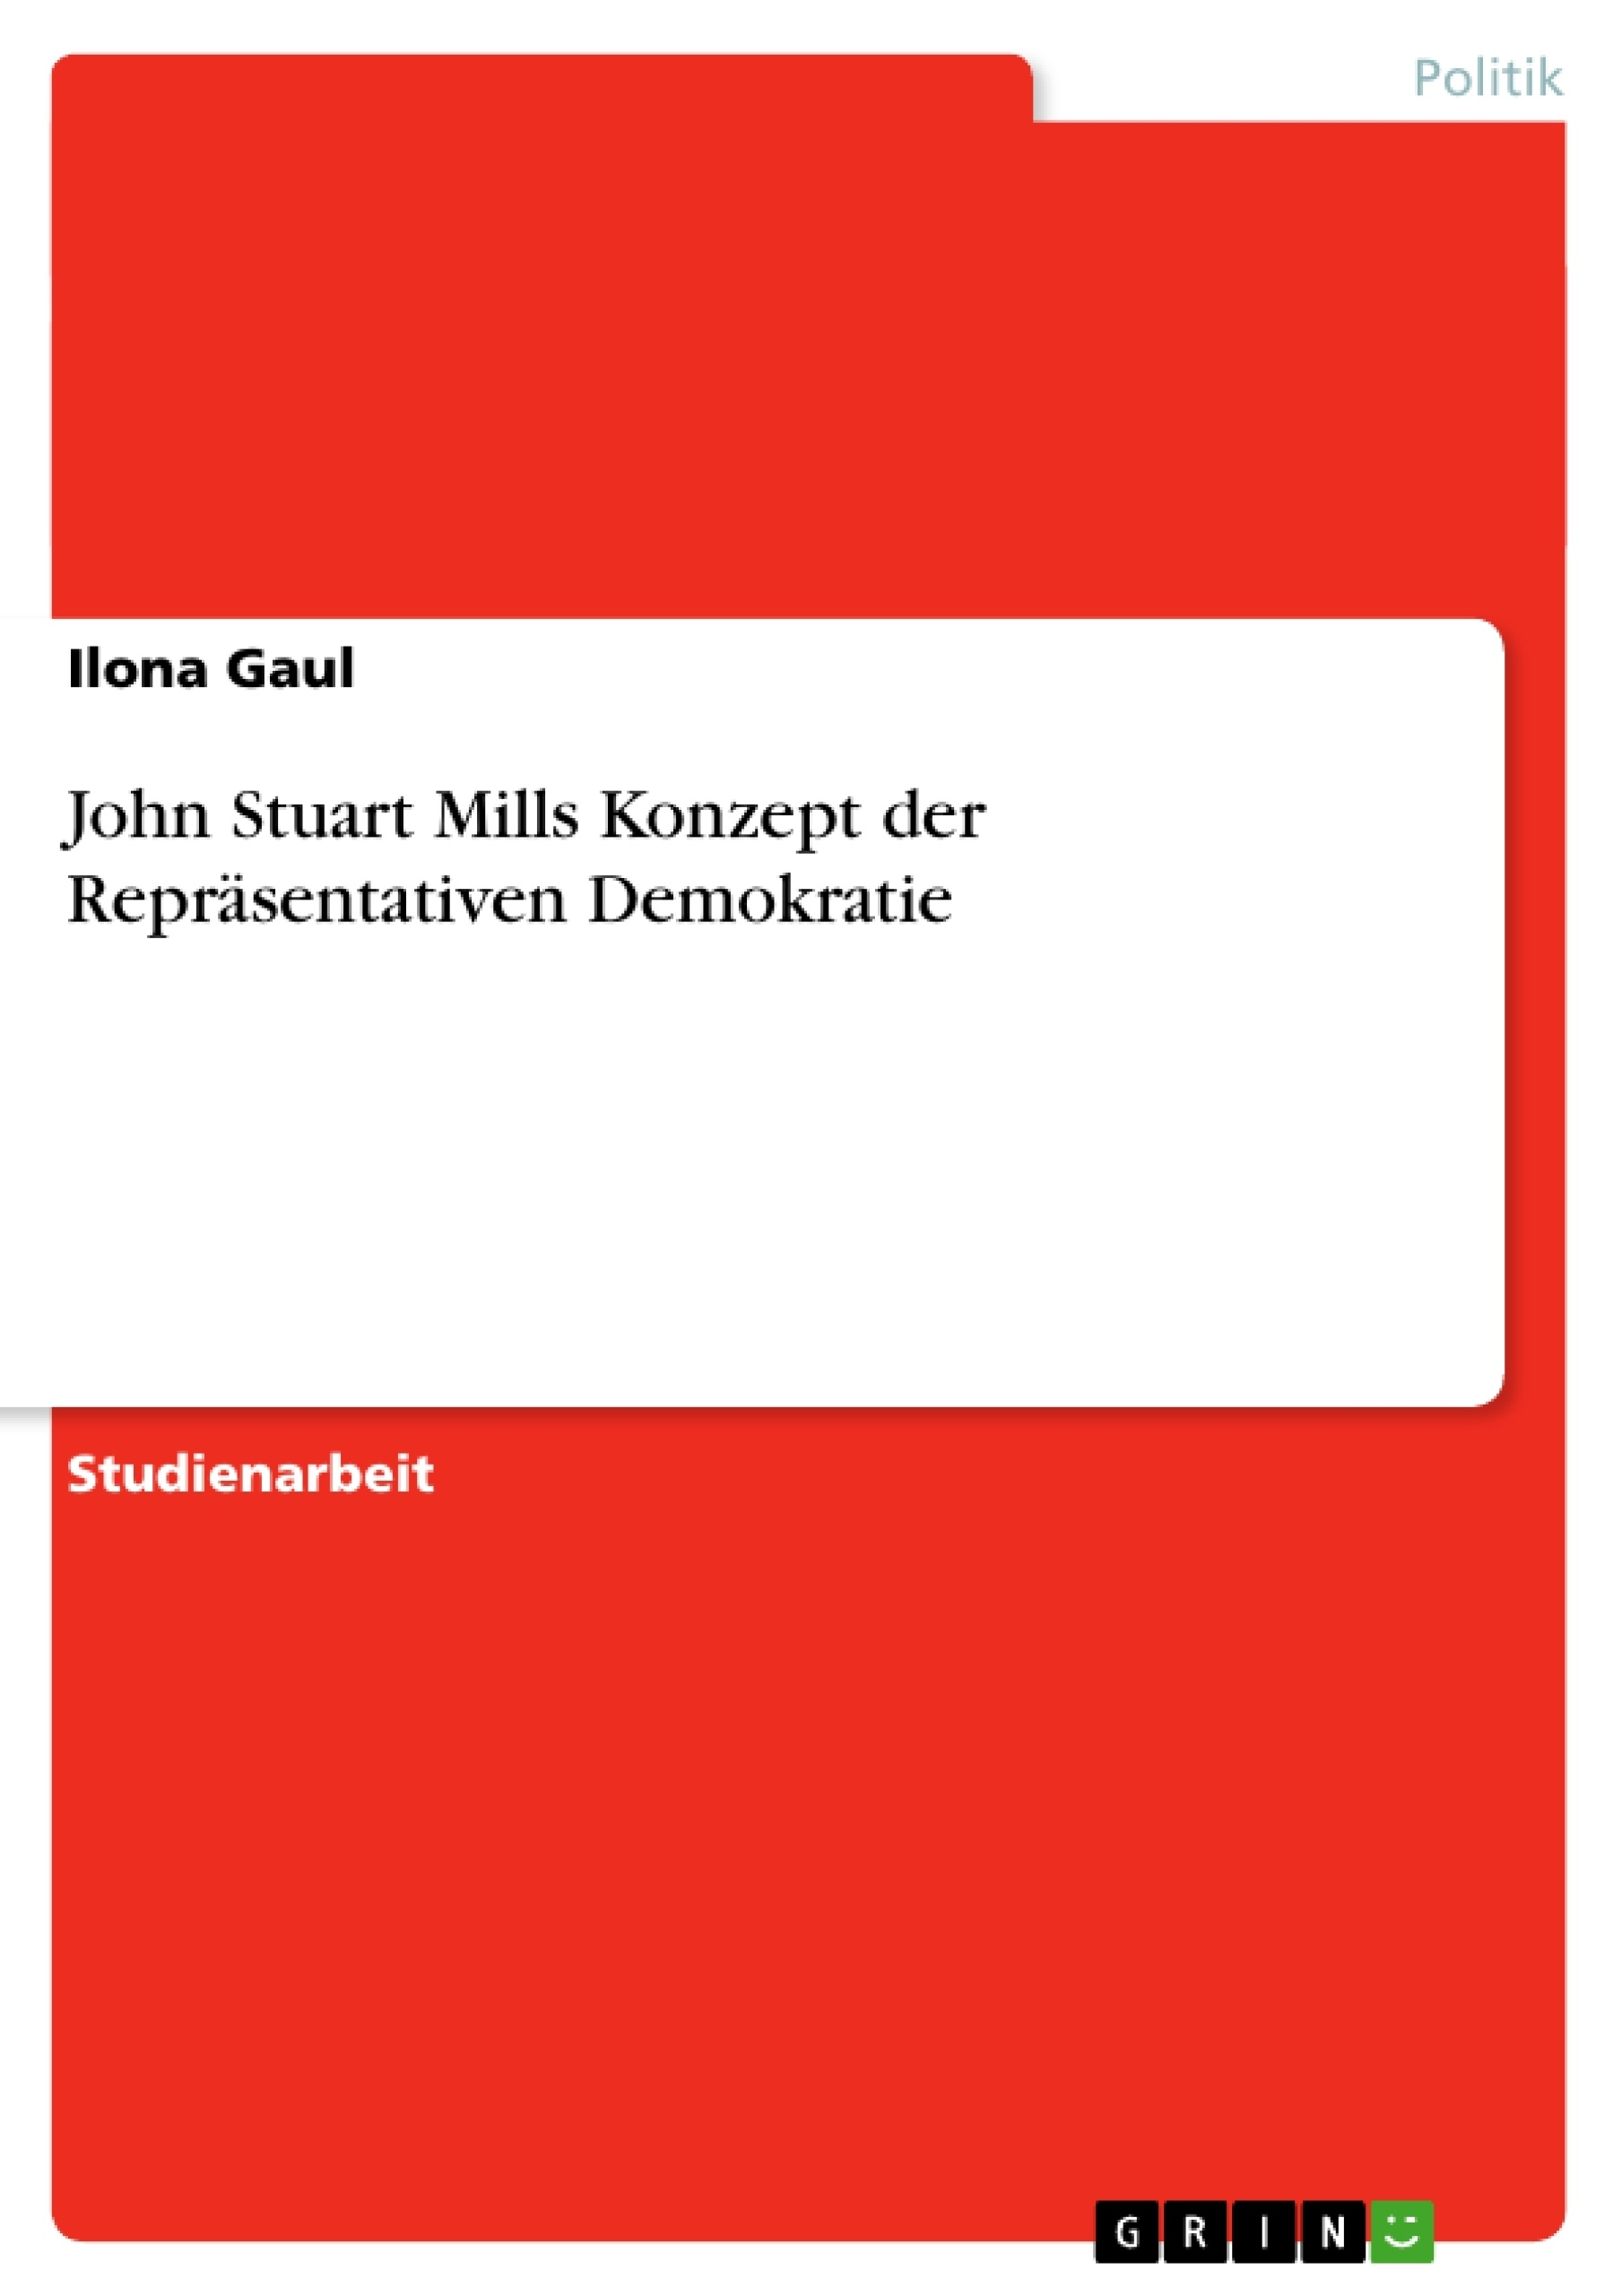 Titel: John Stuart Mills Konzept der Repräsentativen Demokratie